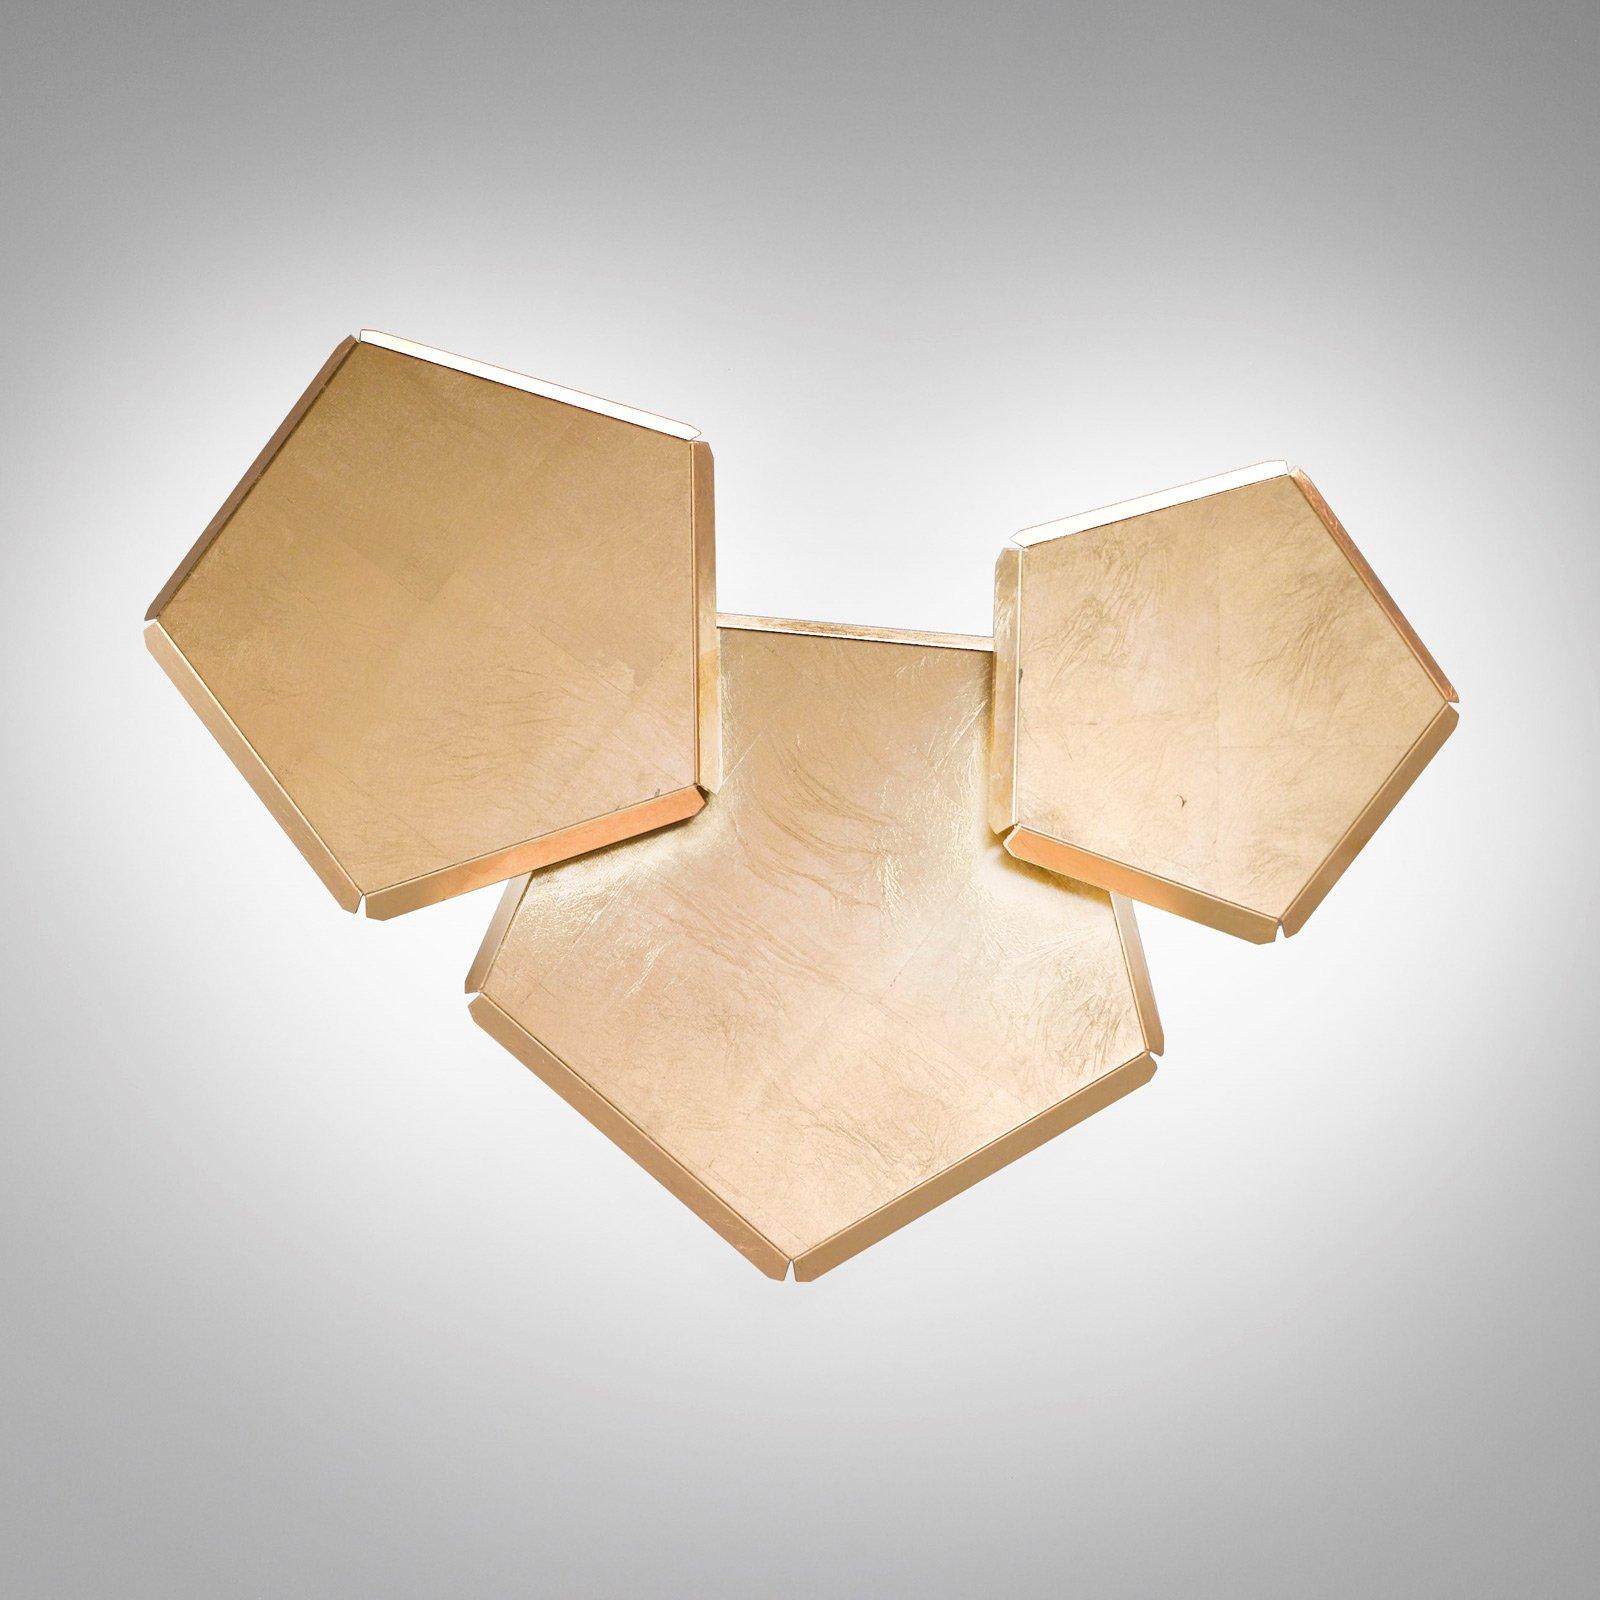 LED-vegglampe Pleiadi med gullblad, 3 lyskilder